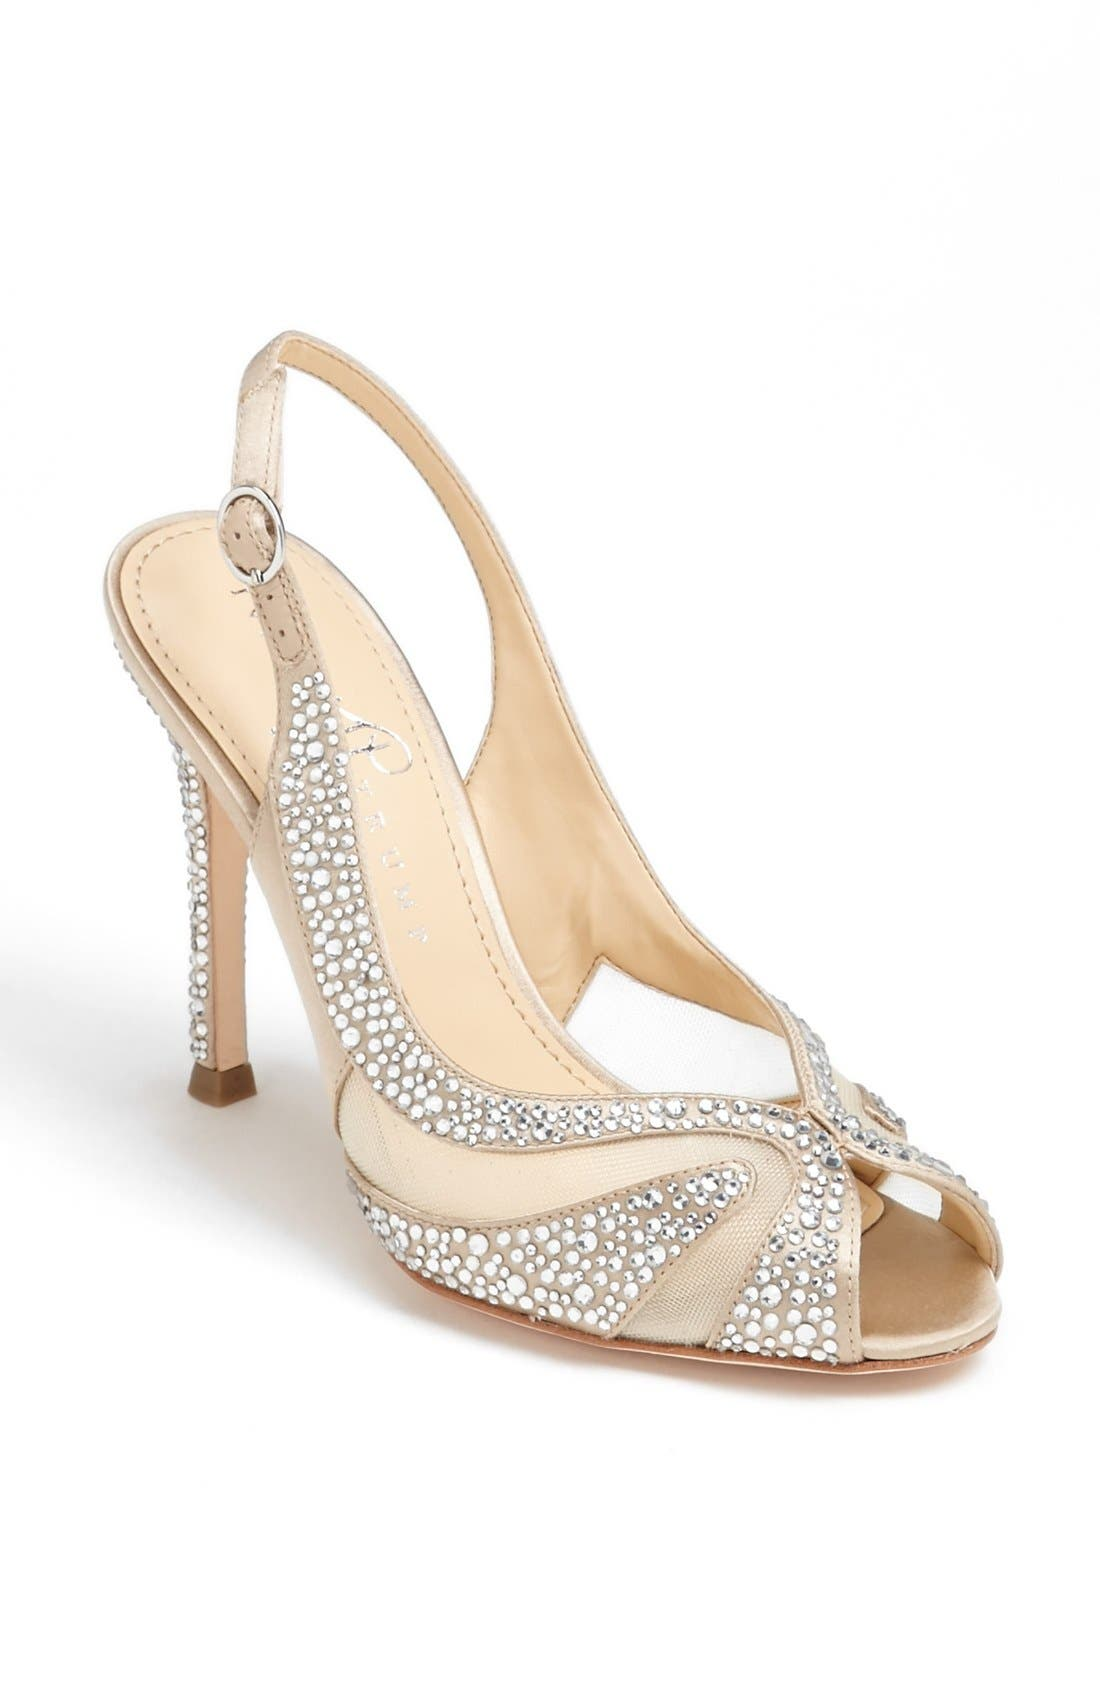 Main Image - Ivanka Trump 'Galantz' Sandal